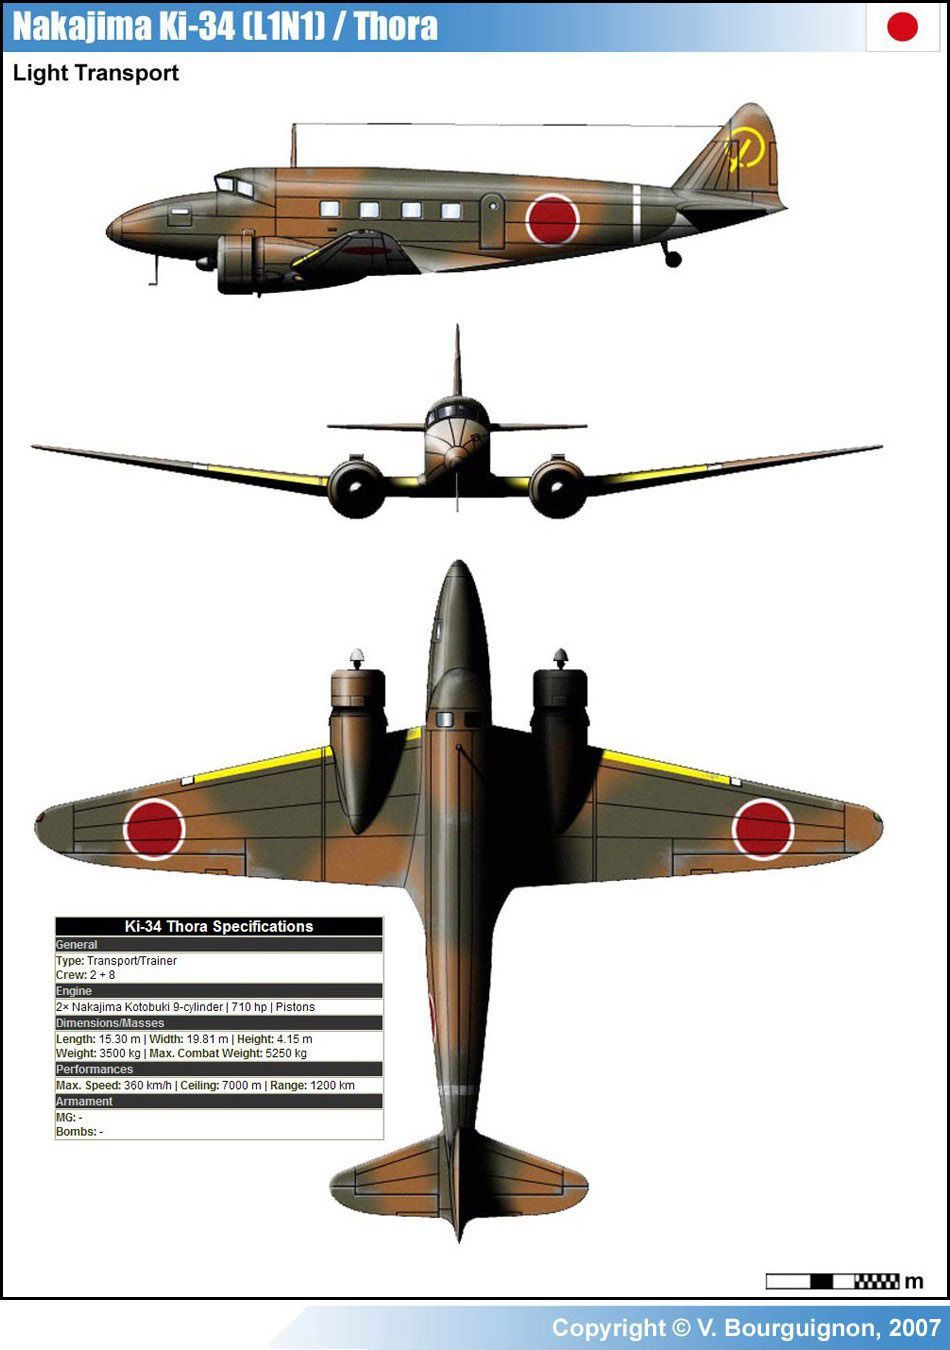 Nakajima Ki-34 was a Japanese light transport aircraft of World War